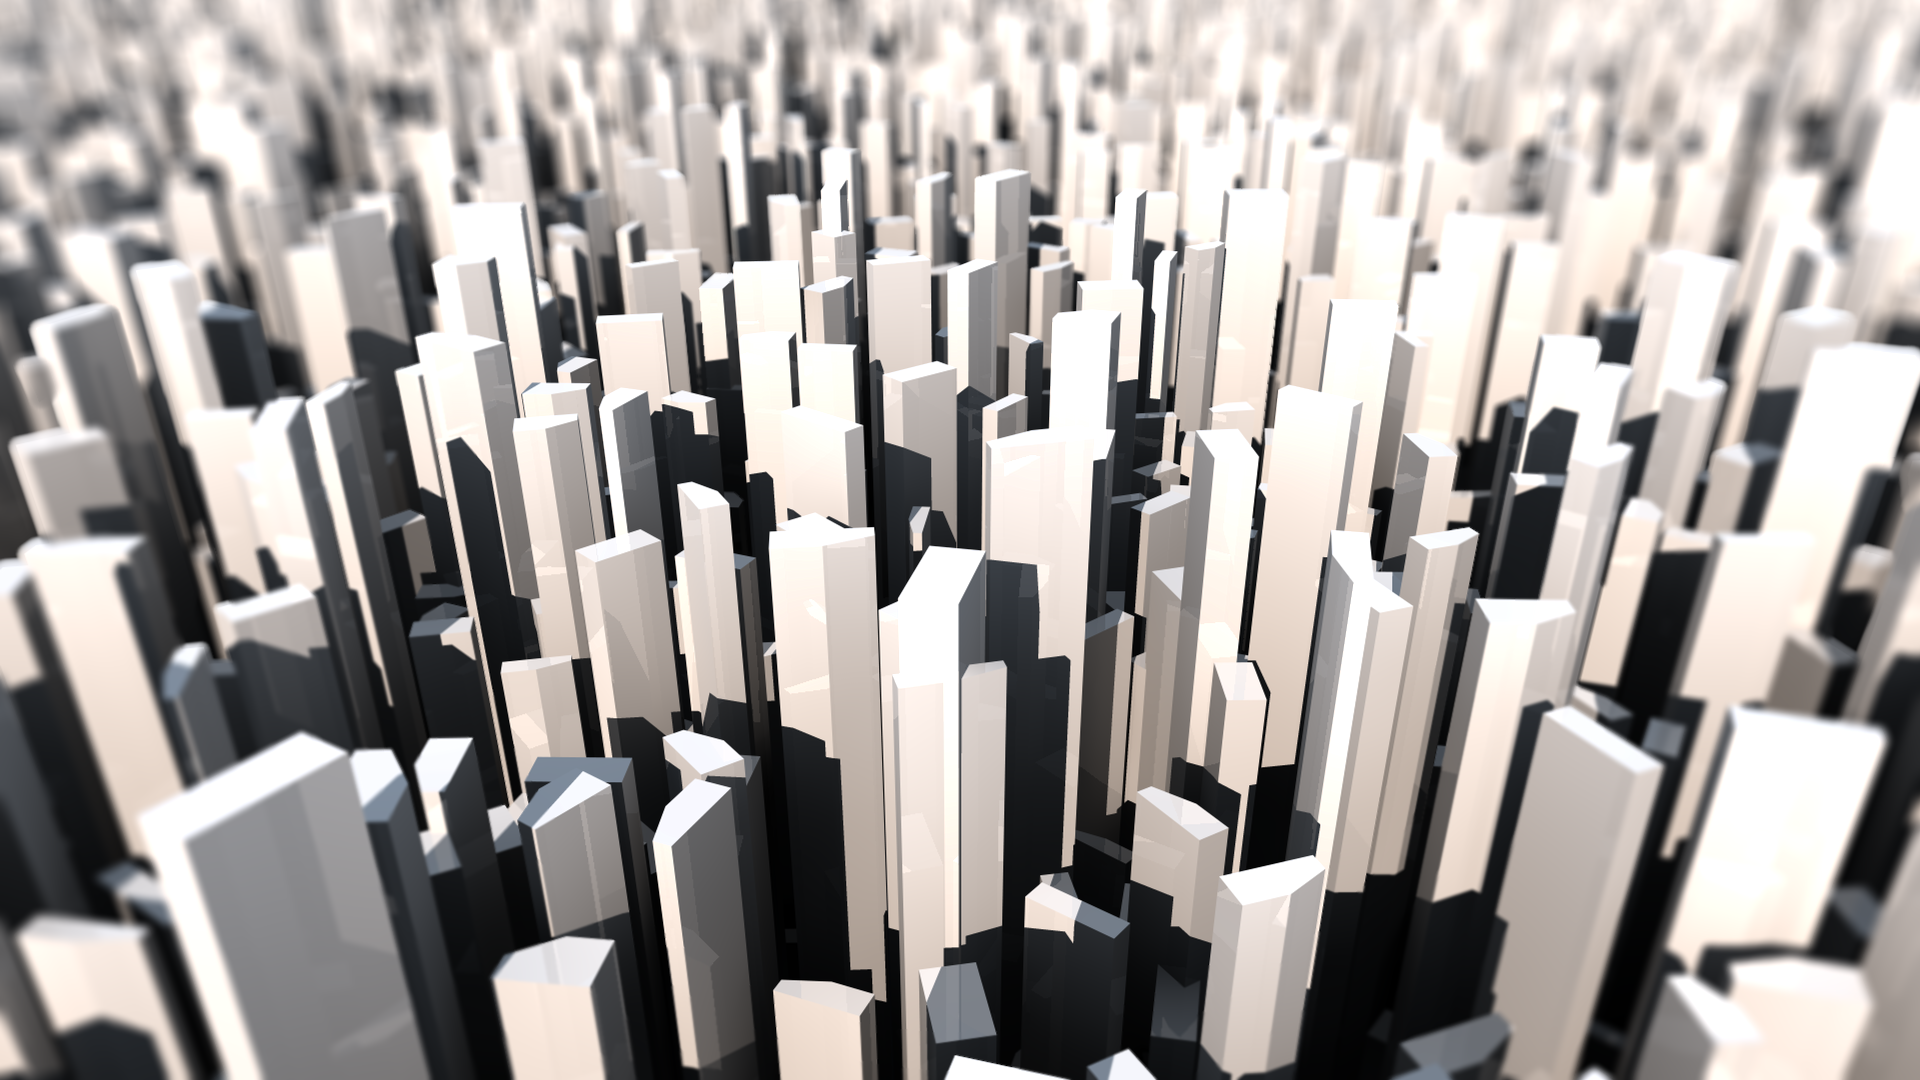 City by macsix